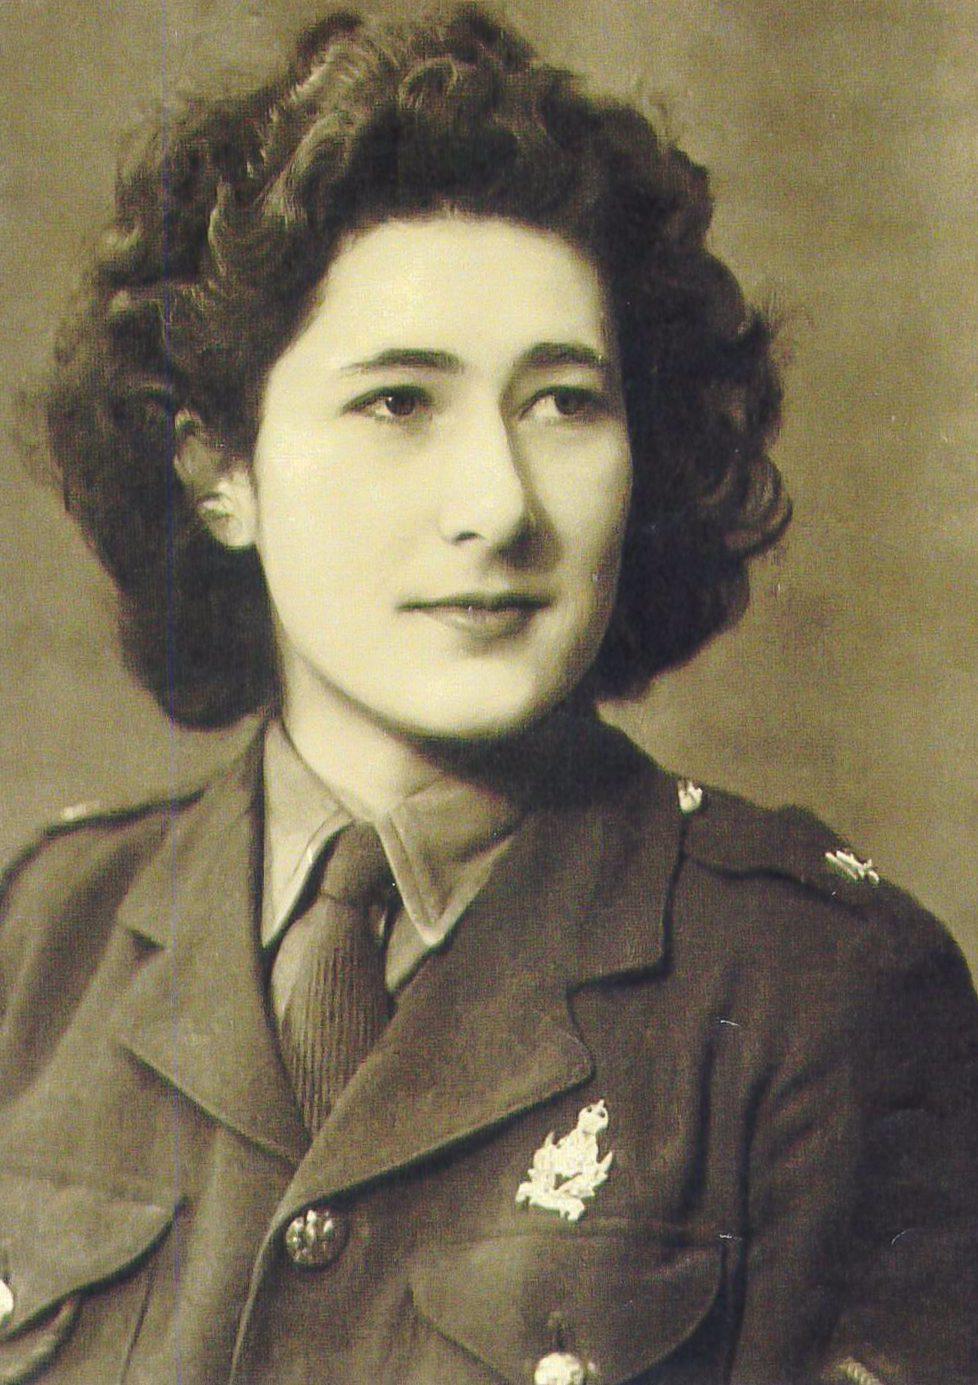 Juliet in uniform during her wartime service